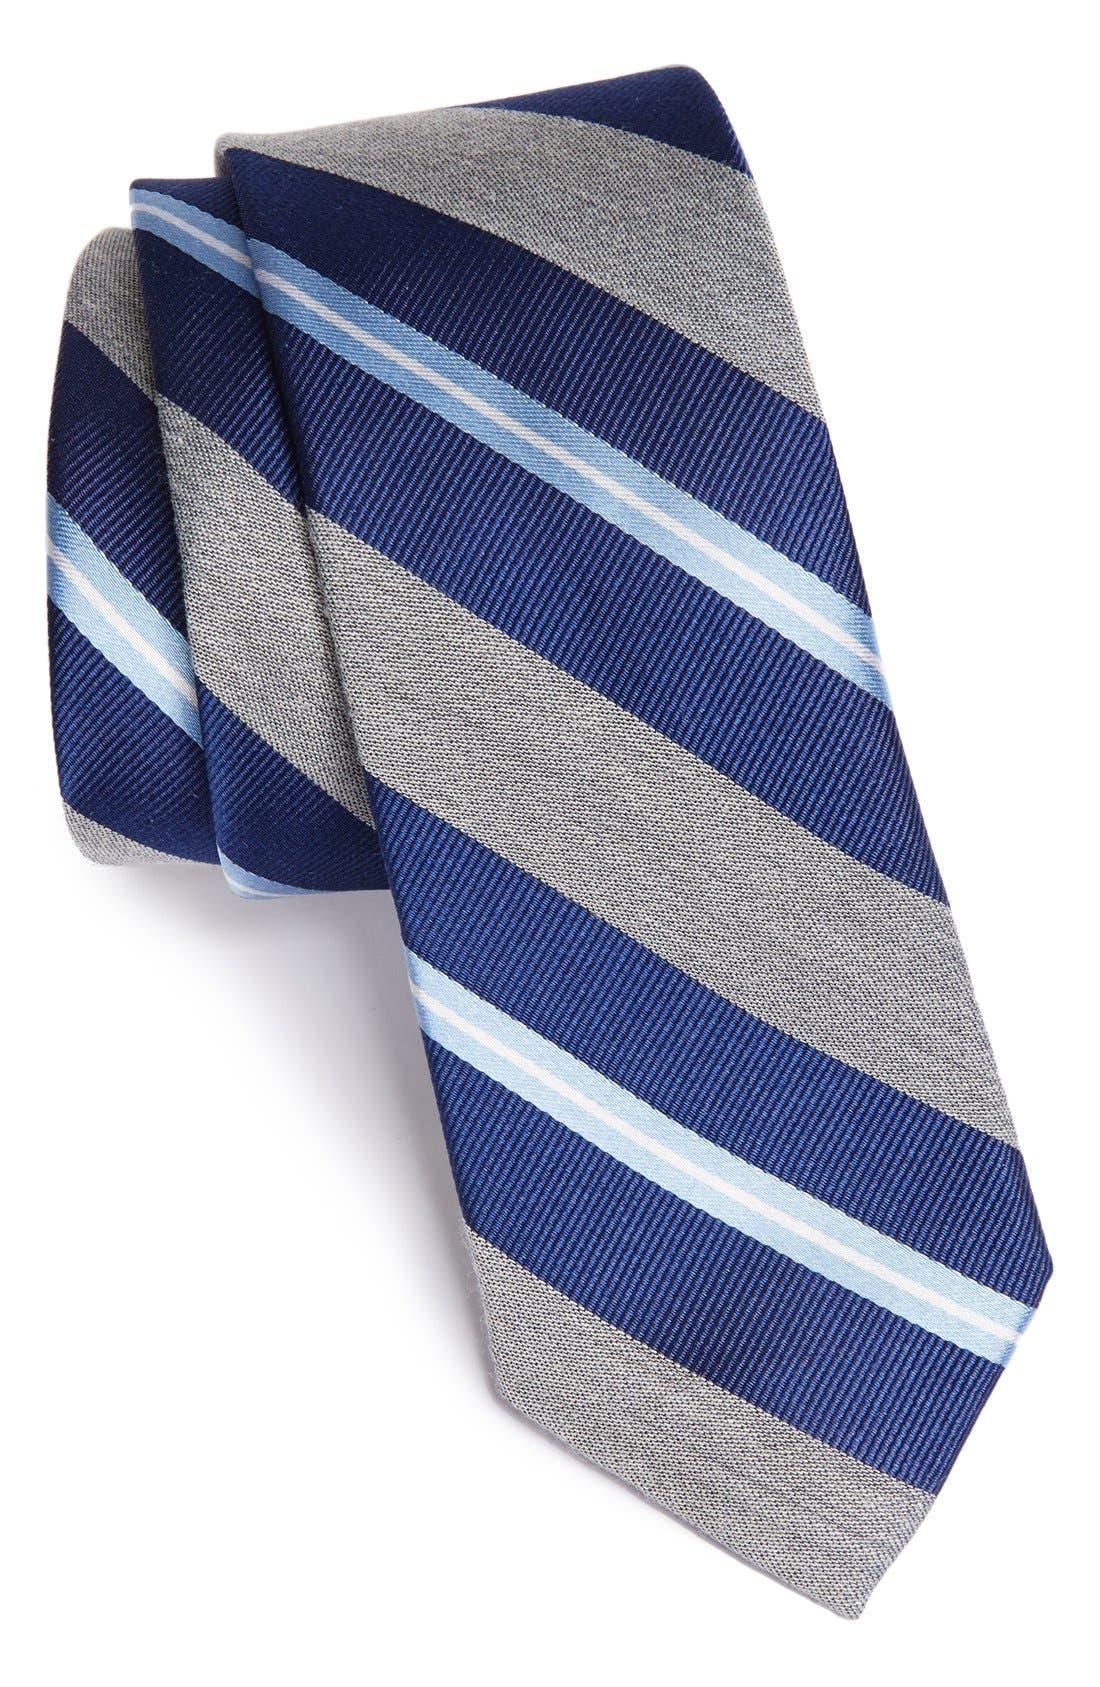 'Brady' Woven Silk Blend Tie,                         Main,                         color, Navy